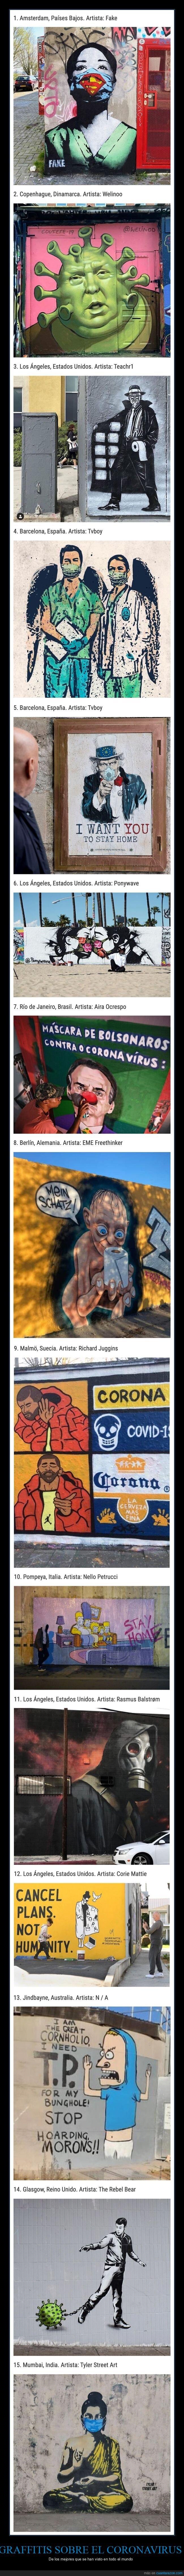 arte urbano,coronavirus,graffiti